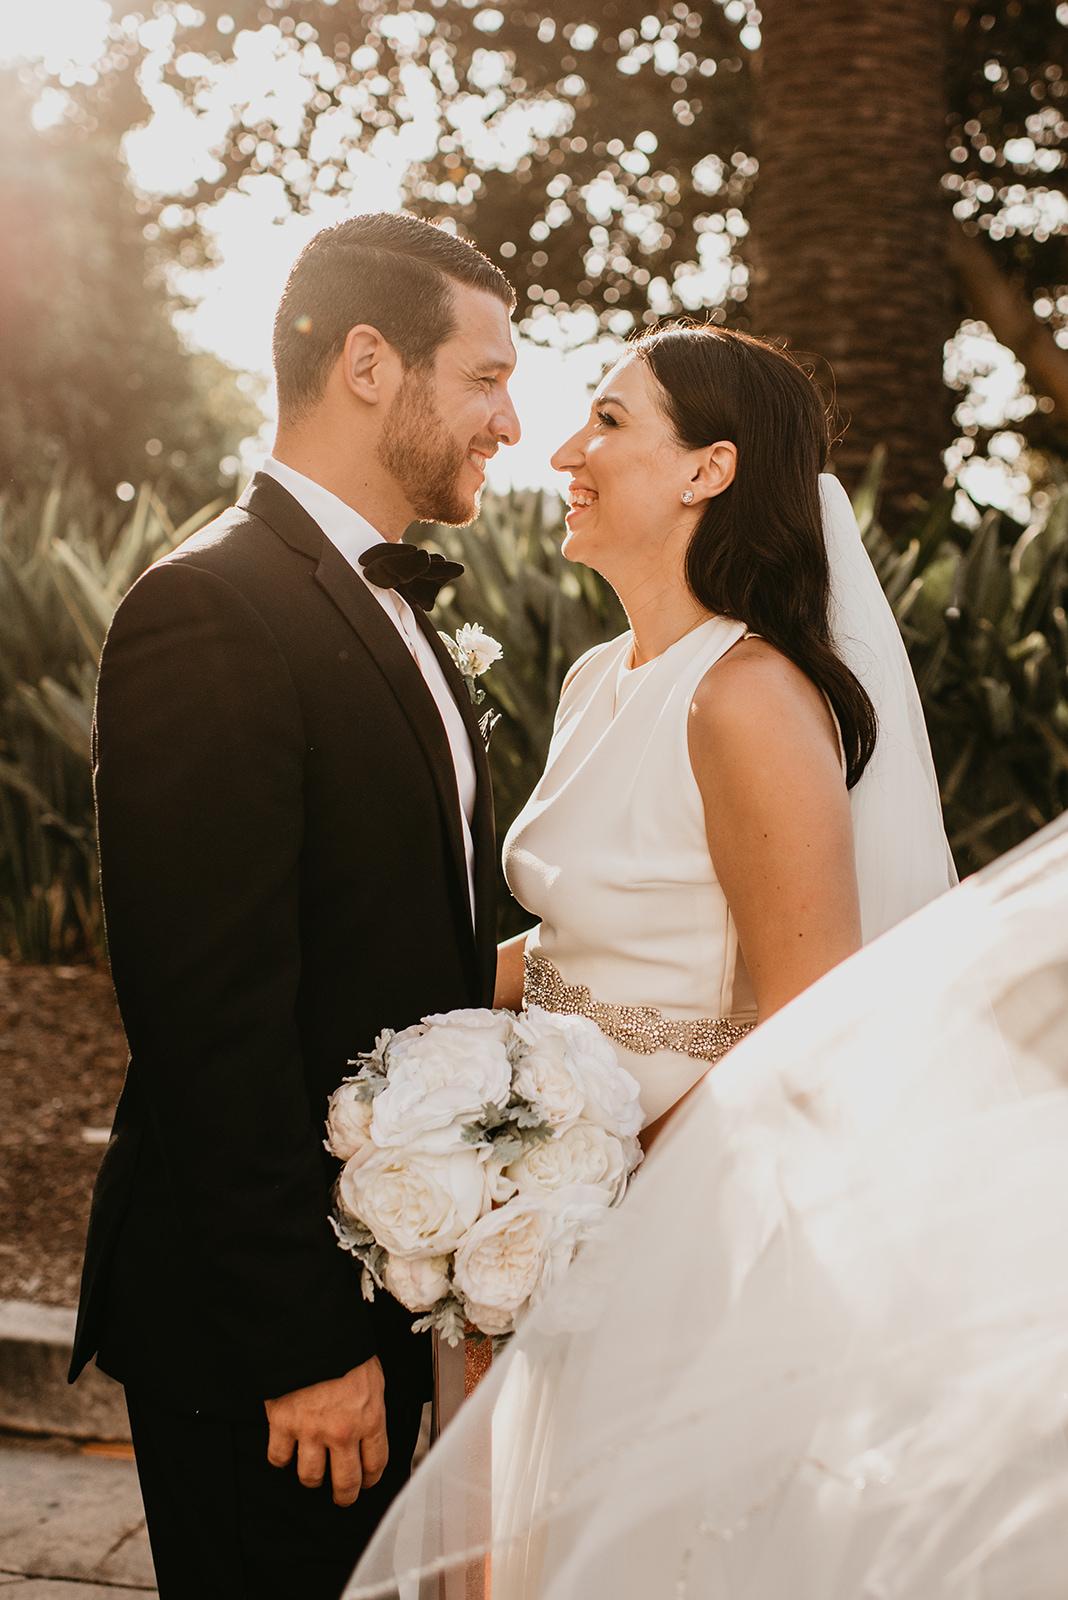 Fashion Island Wedding in California - Bride and Groom